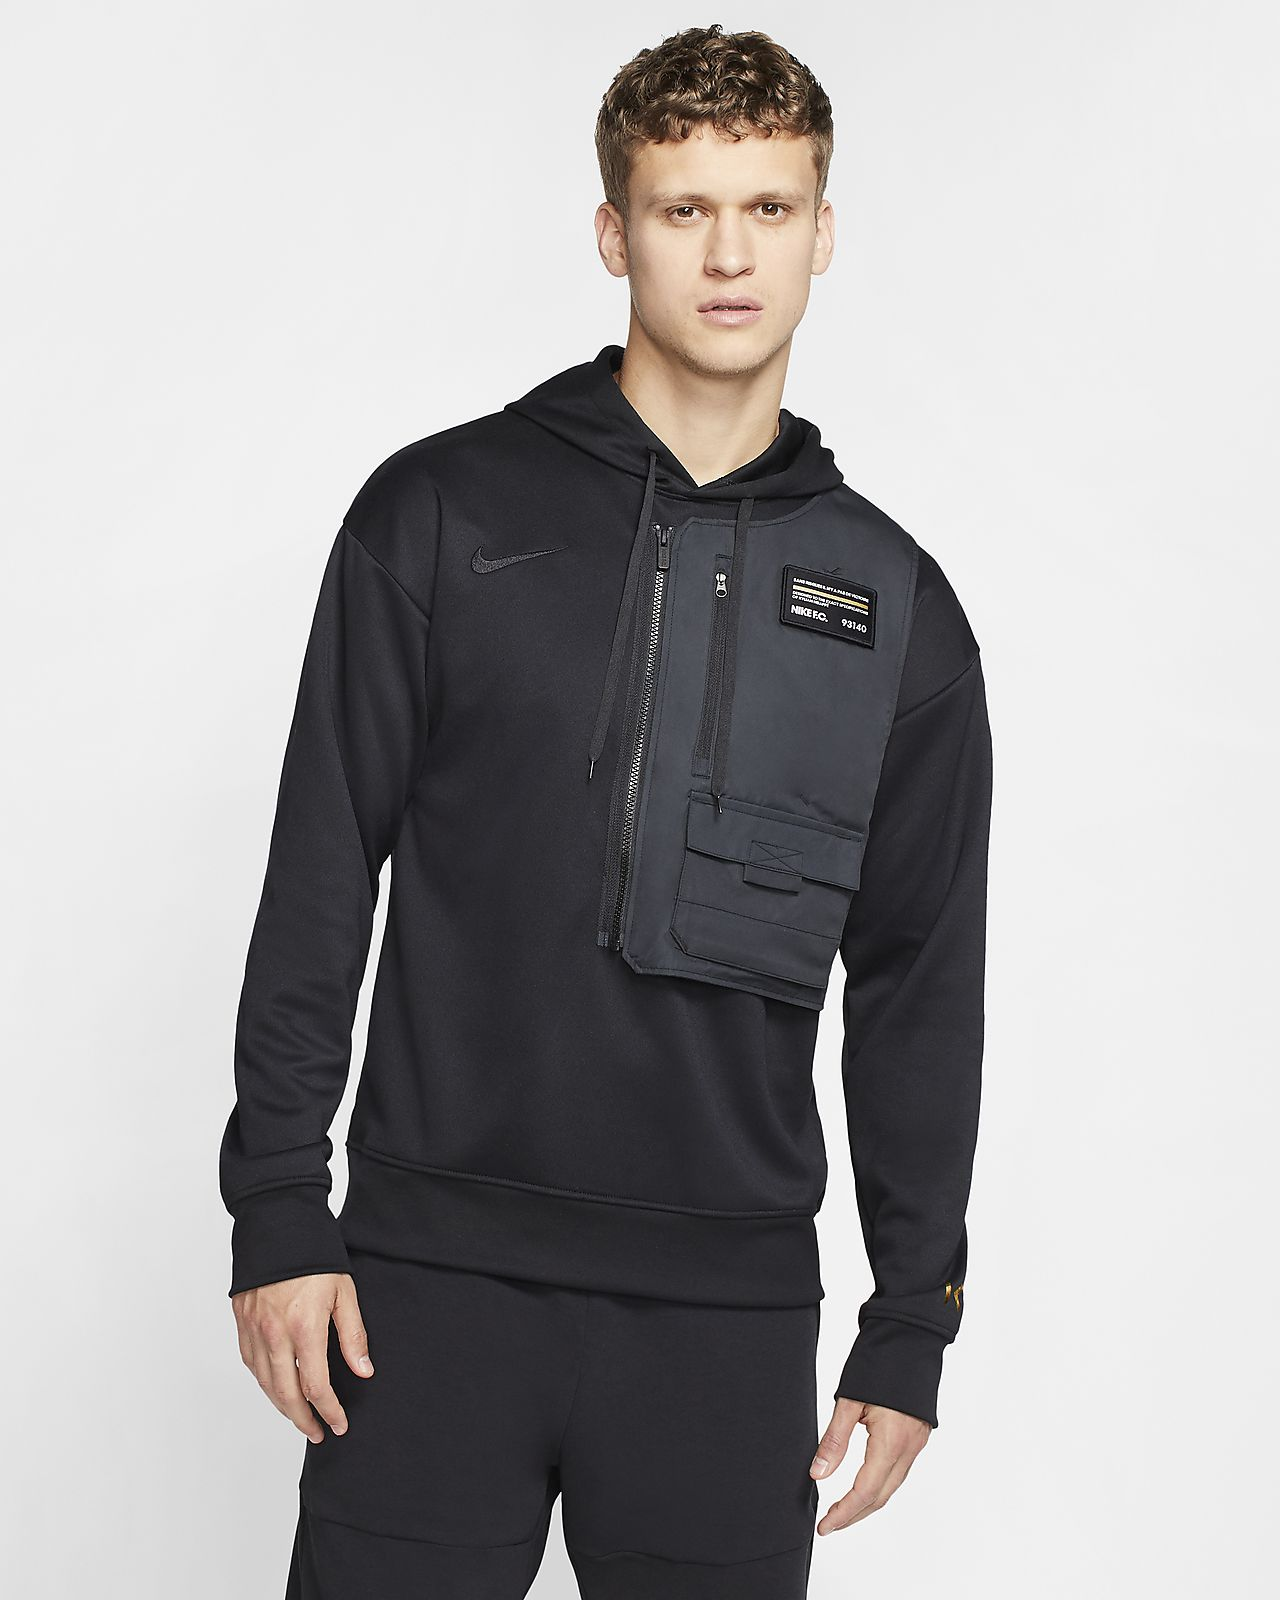 Nike Dri-FIT Bondy Kapüşonlu Erkek Futbol Sweatshirt'ü